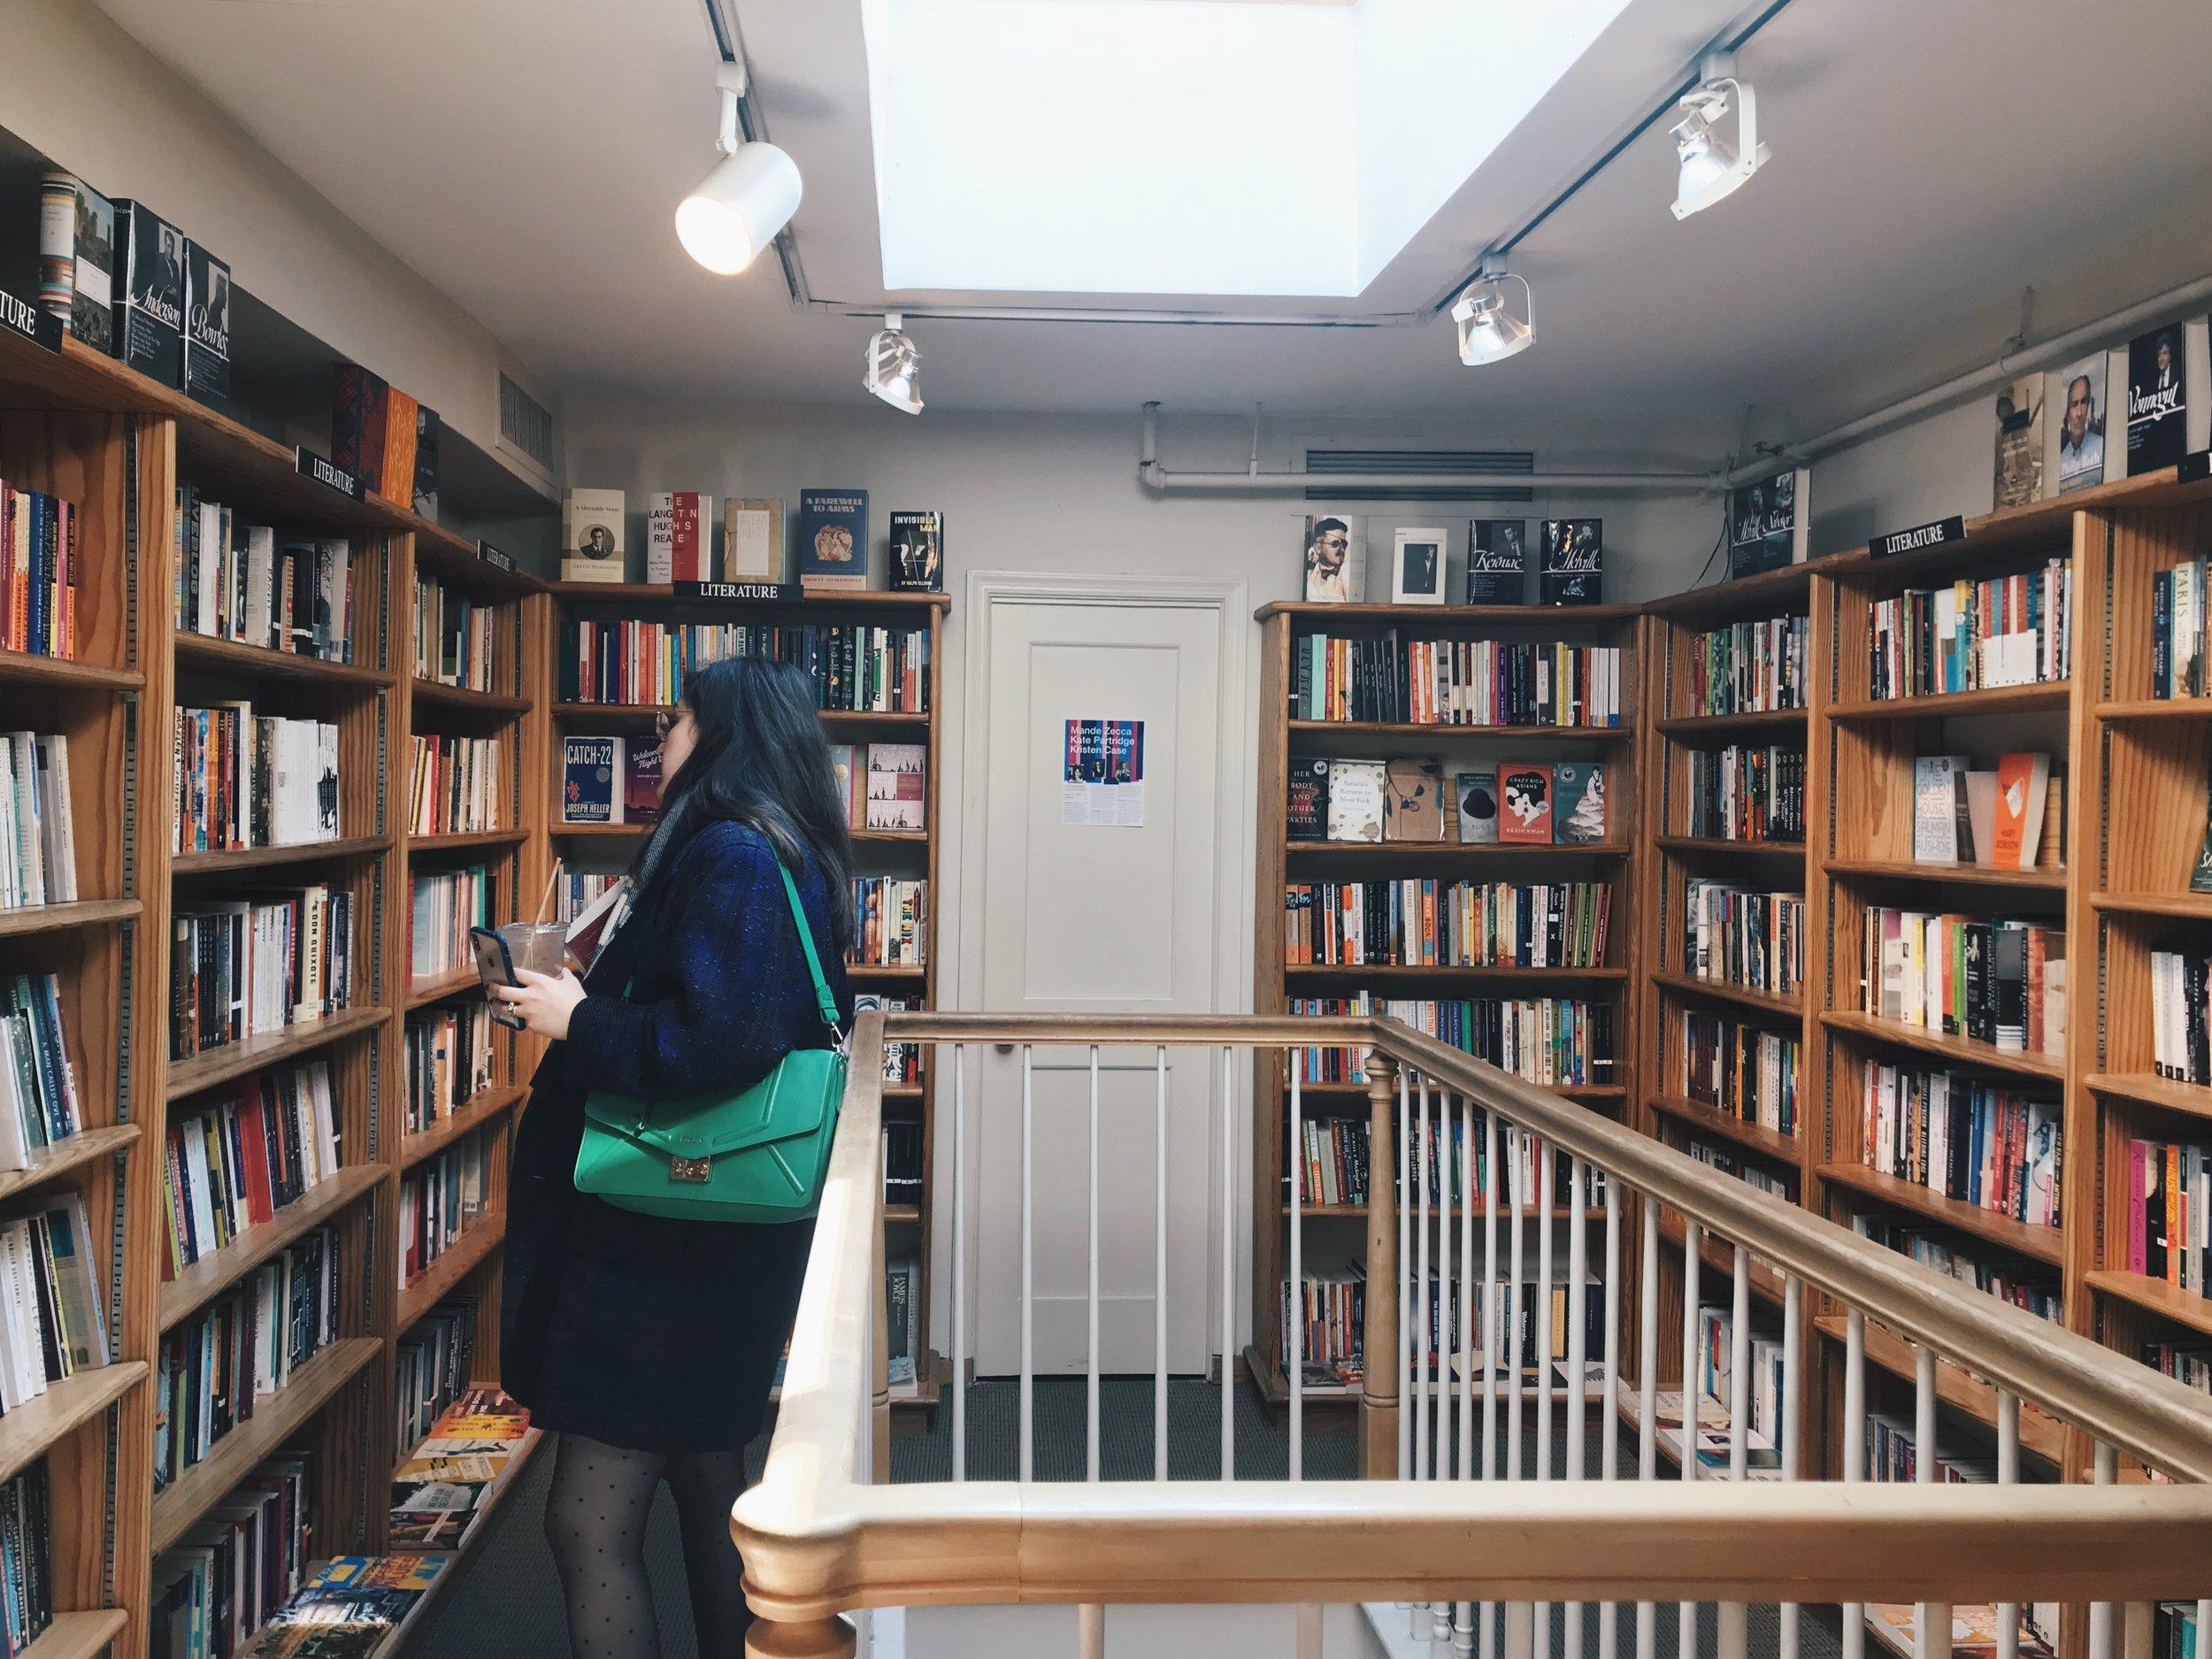 Bridge Street Books Georgetown bookshop The Attic on Eighth 2.JPG